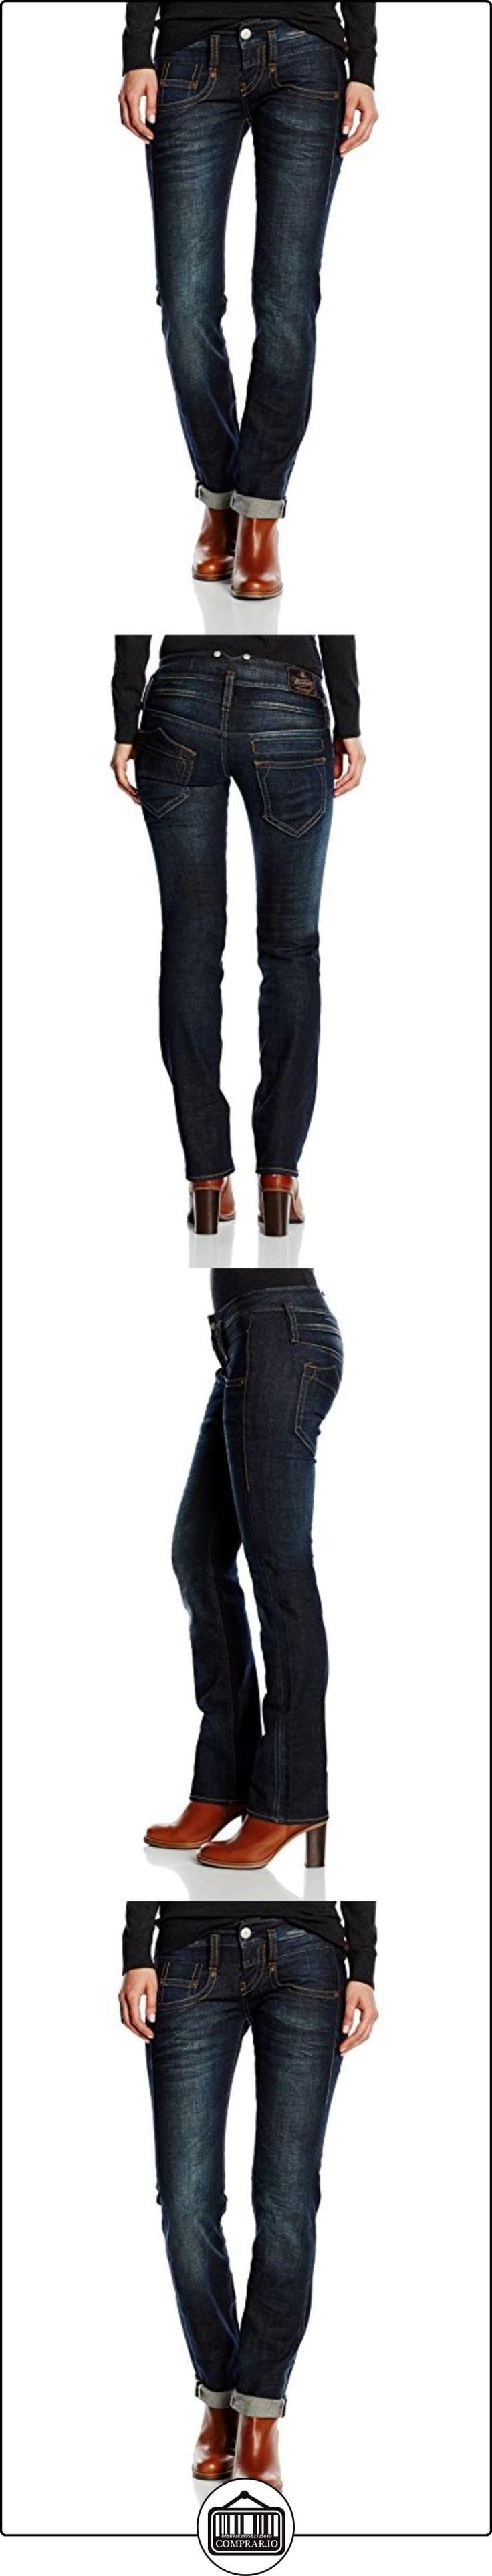 Herrlicher Pitch Denim Stretch - Pantalones straigth para mujer, color blau (night blues 6130), talla W27/L34 (27/34)  ✿ Vaqueros ✿